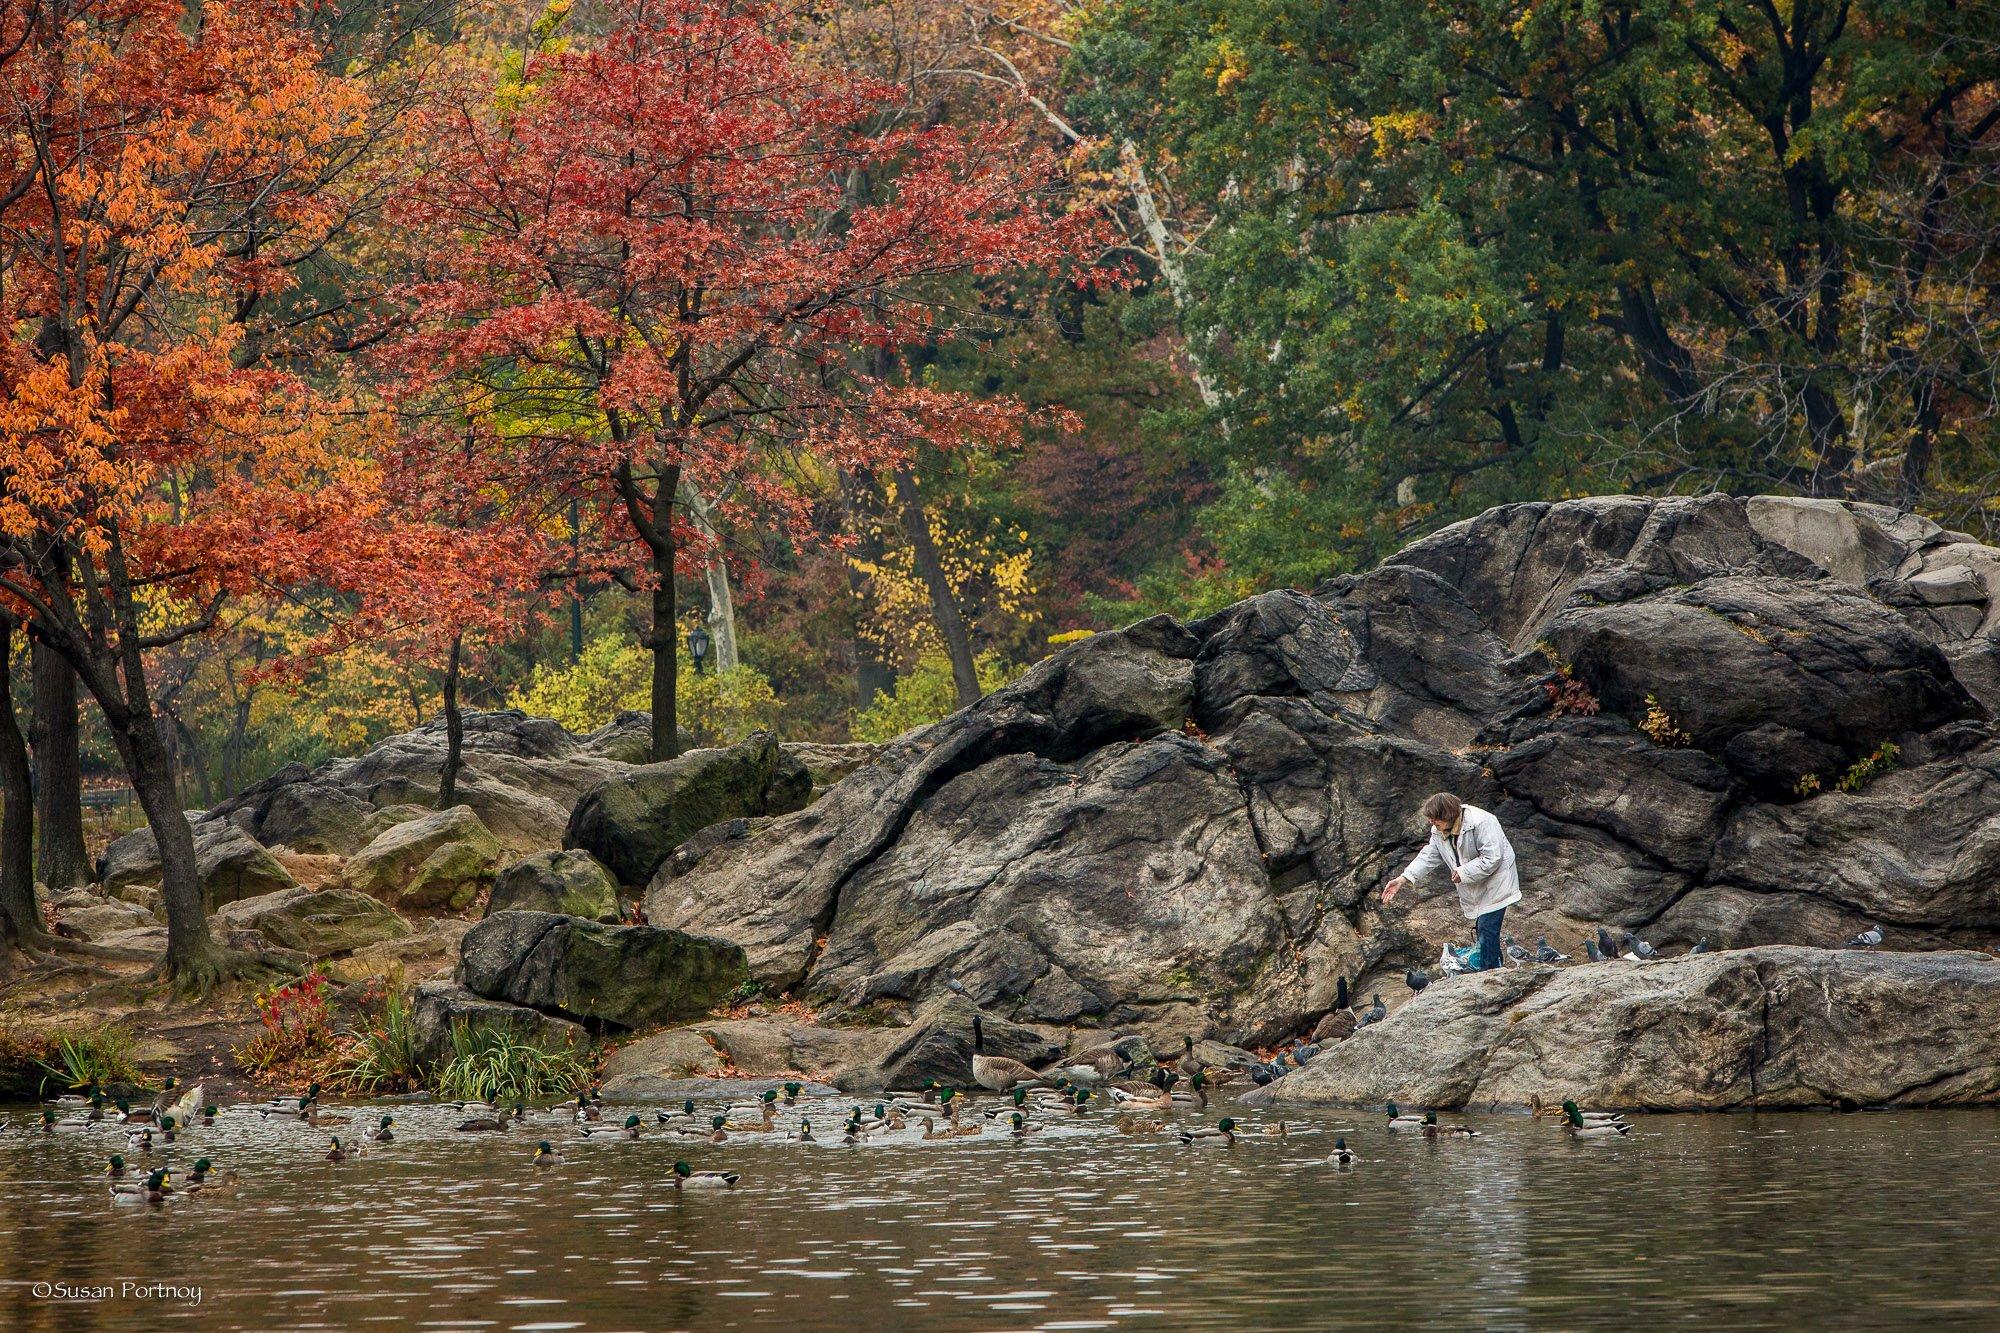 Lillian Bobo feeds the birds of the Hernshead in Central Park